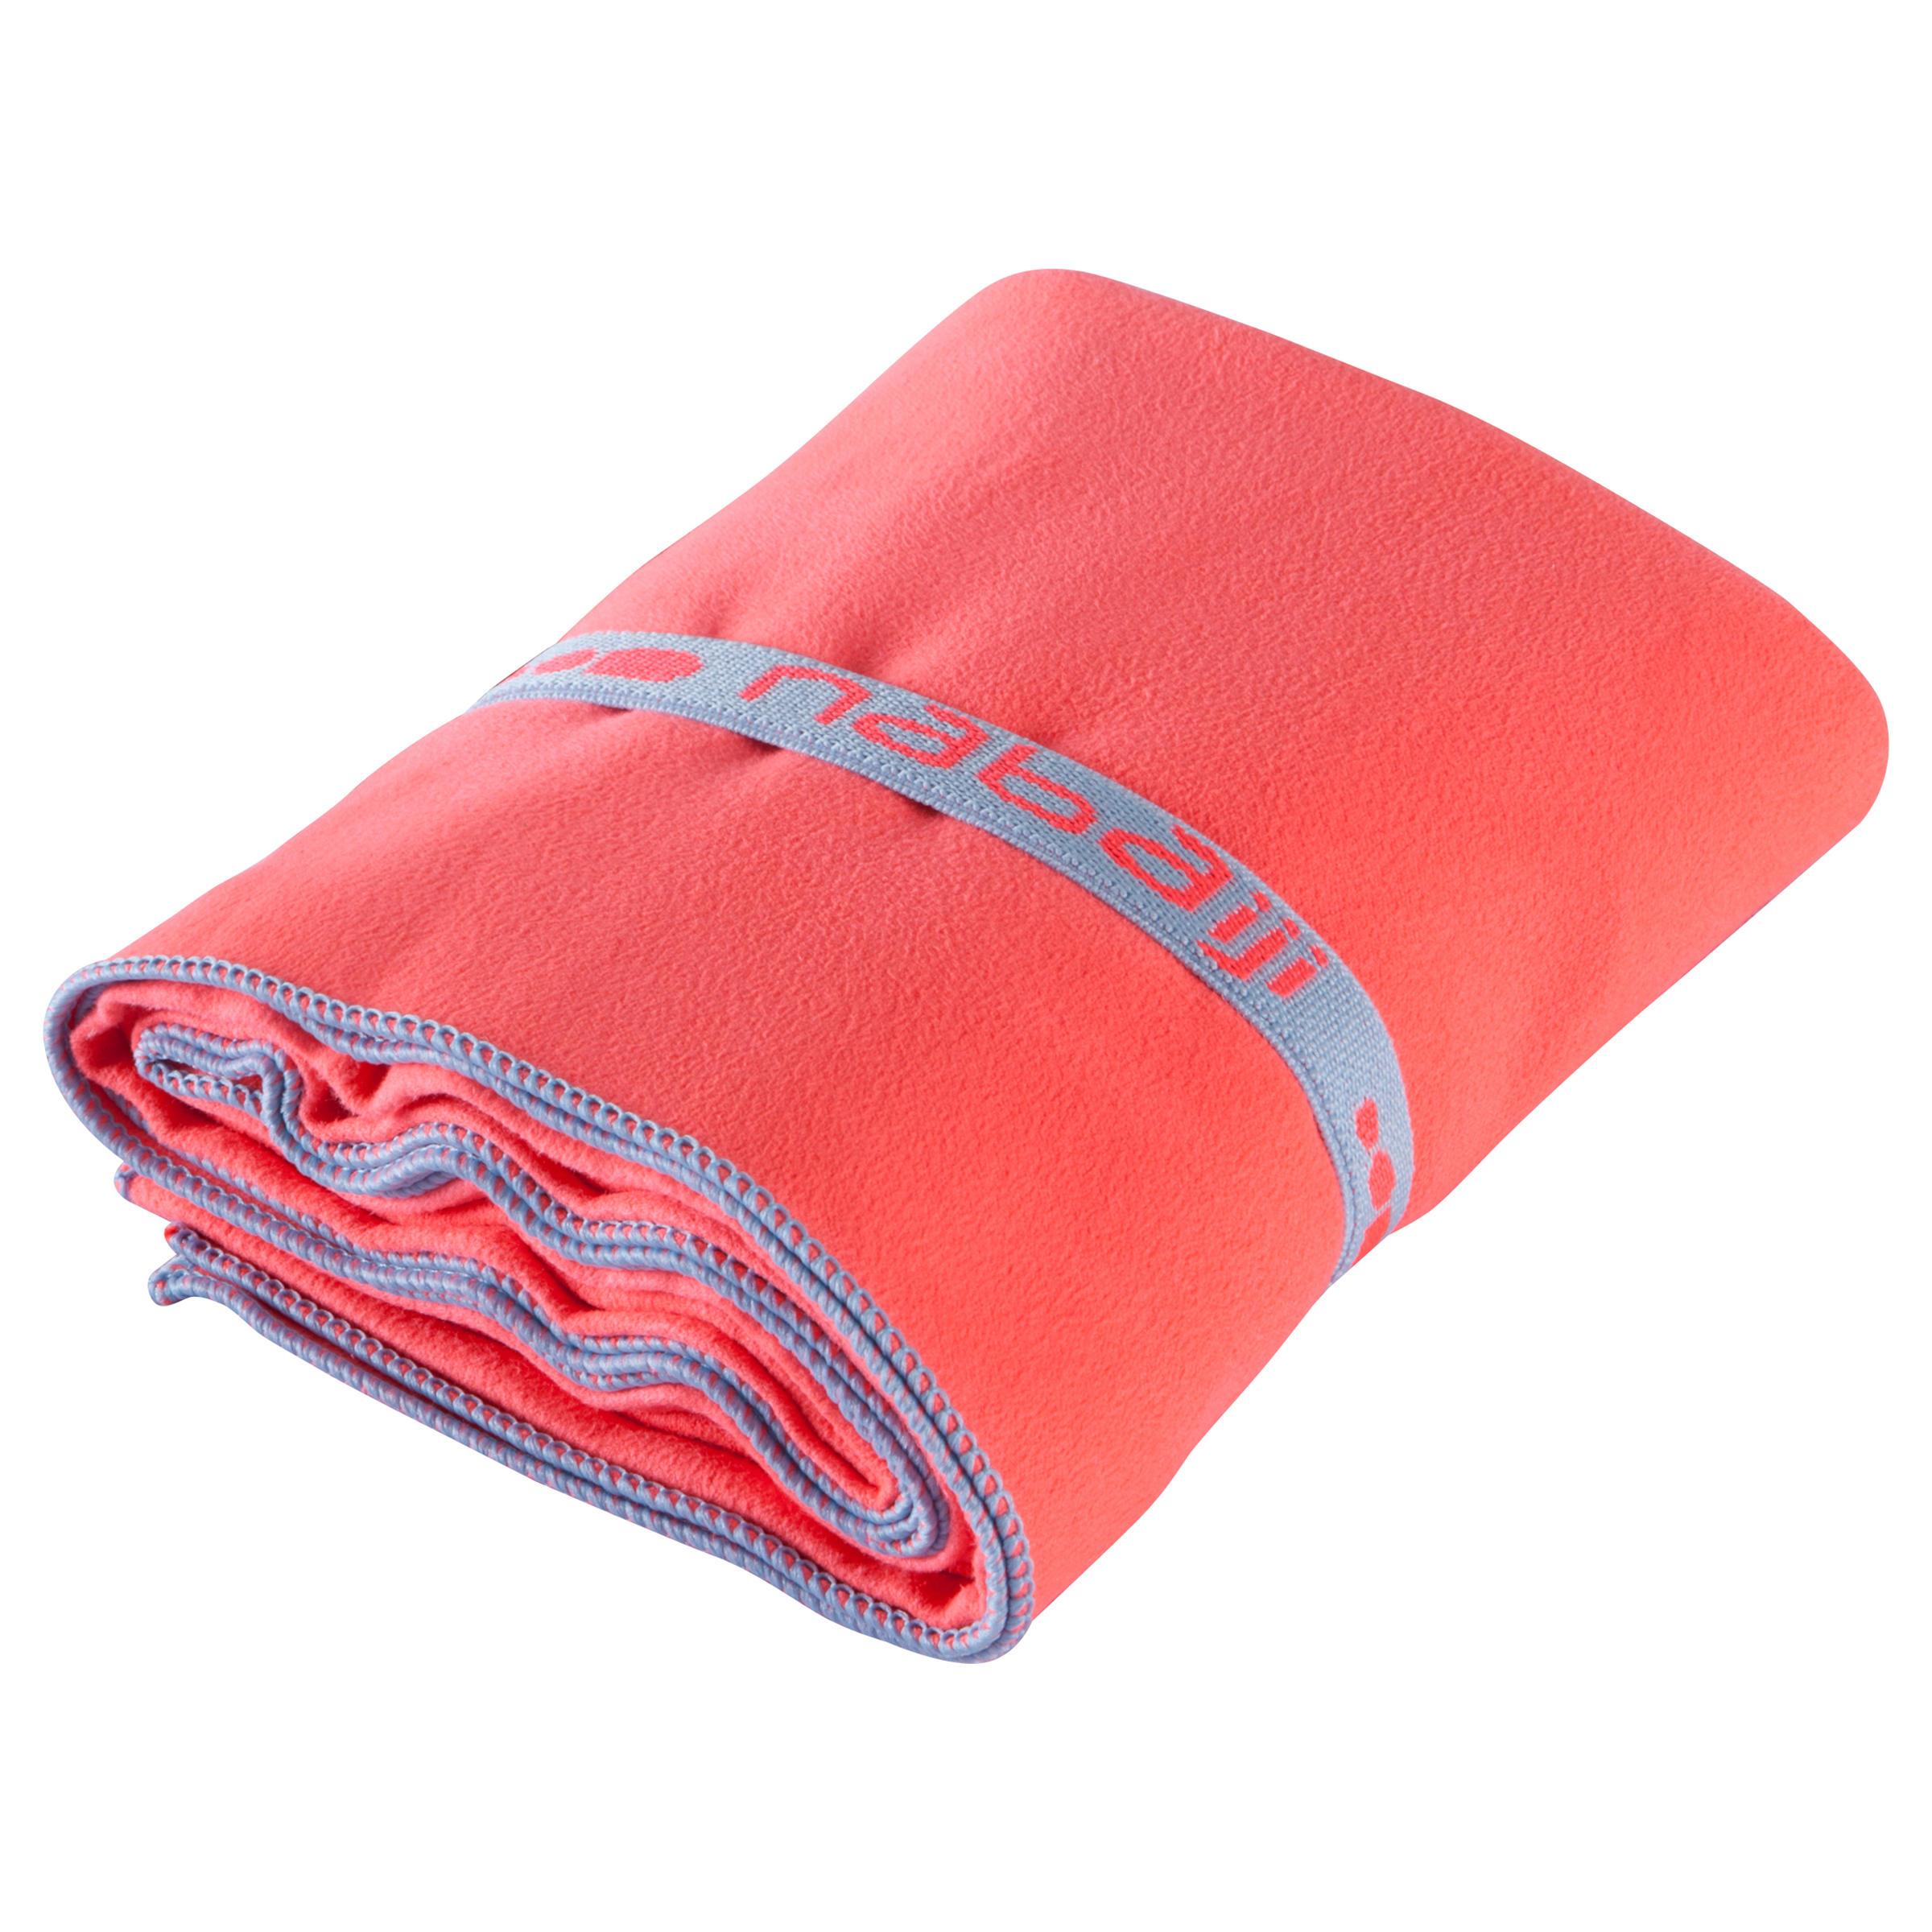 Microfibre Towel L - Orange